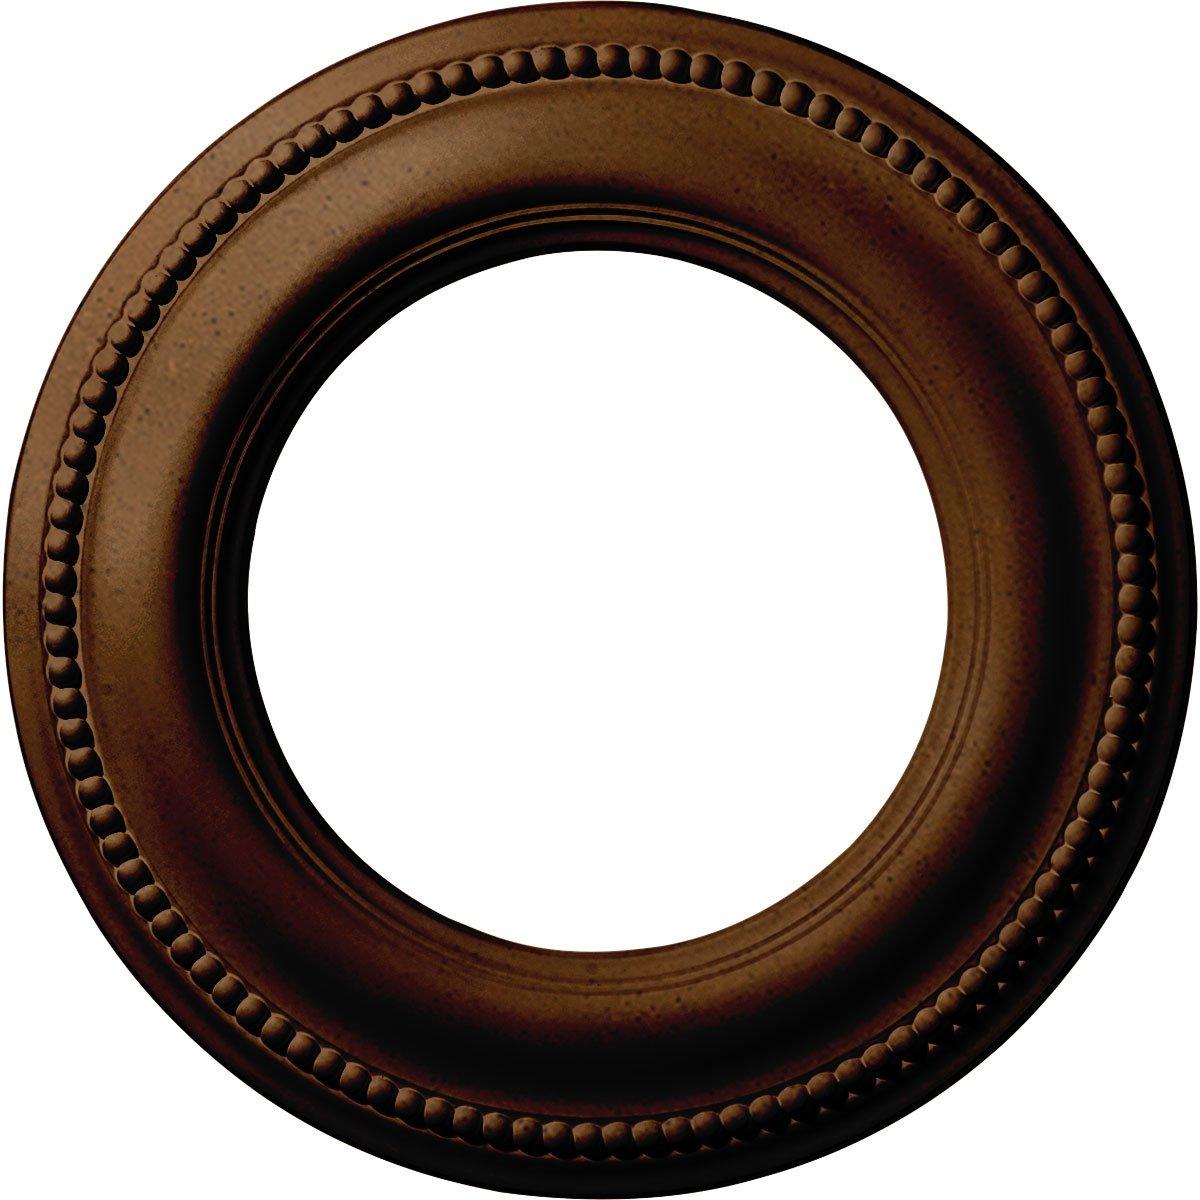 Ekena Millwork CM13BRRZS 13'' x 7-1/2'' x 3/4'' Bradford Classic Ceiling Medallion, Rubbed Bronze